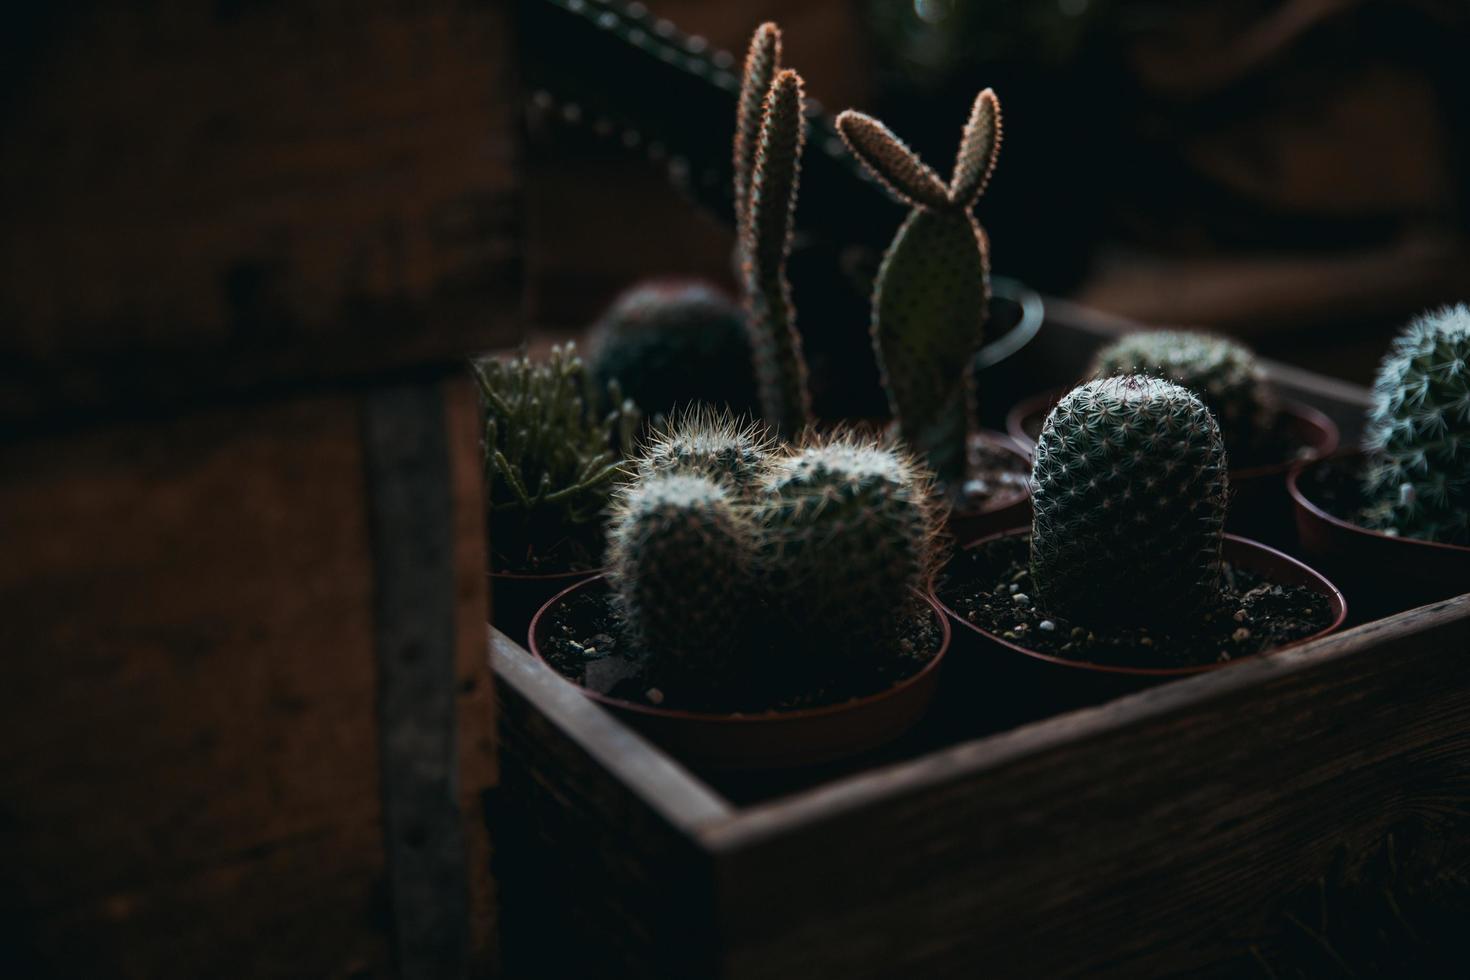 gröna kaktusplantor foto